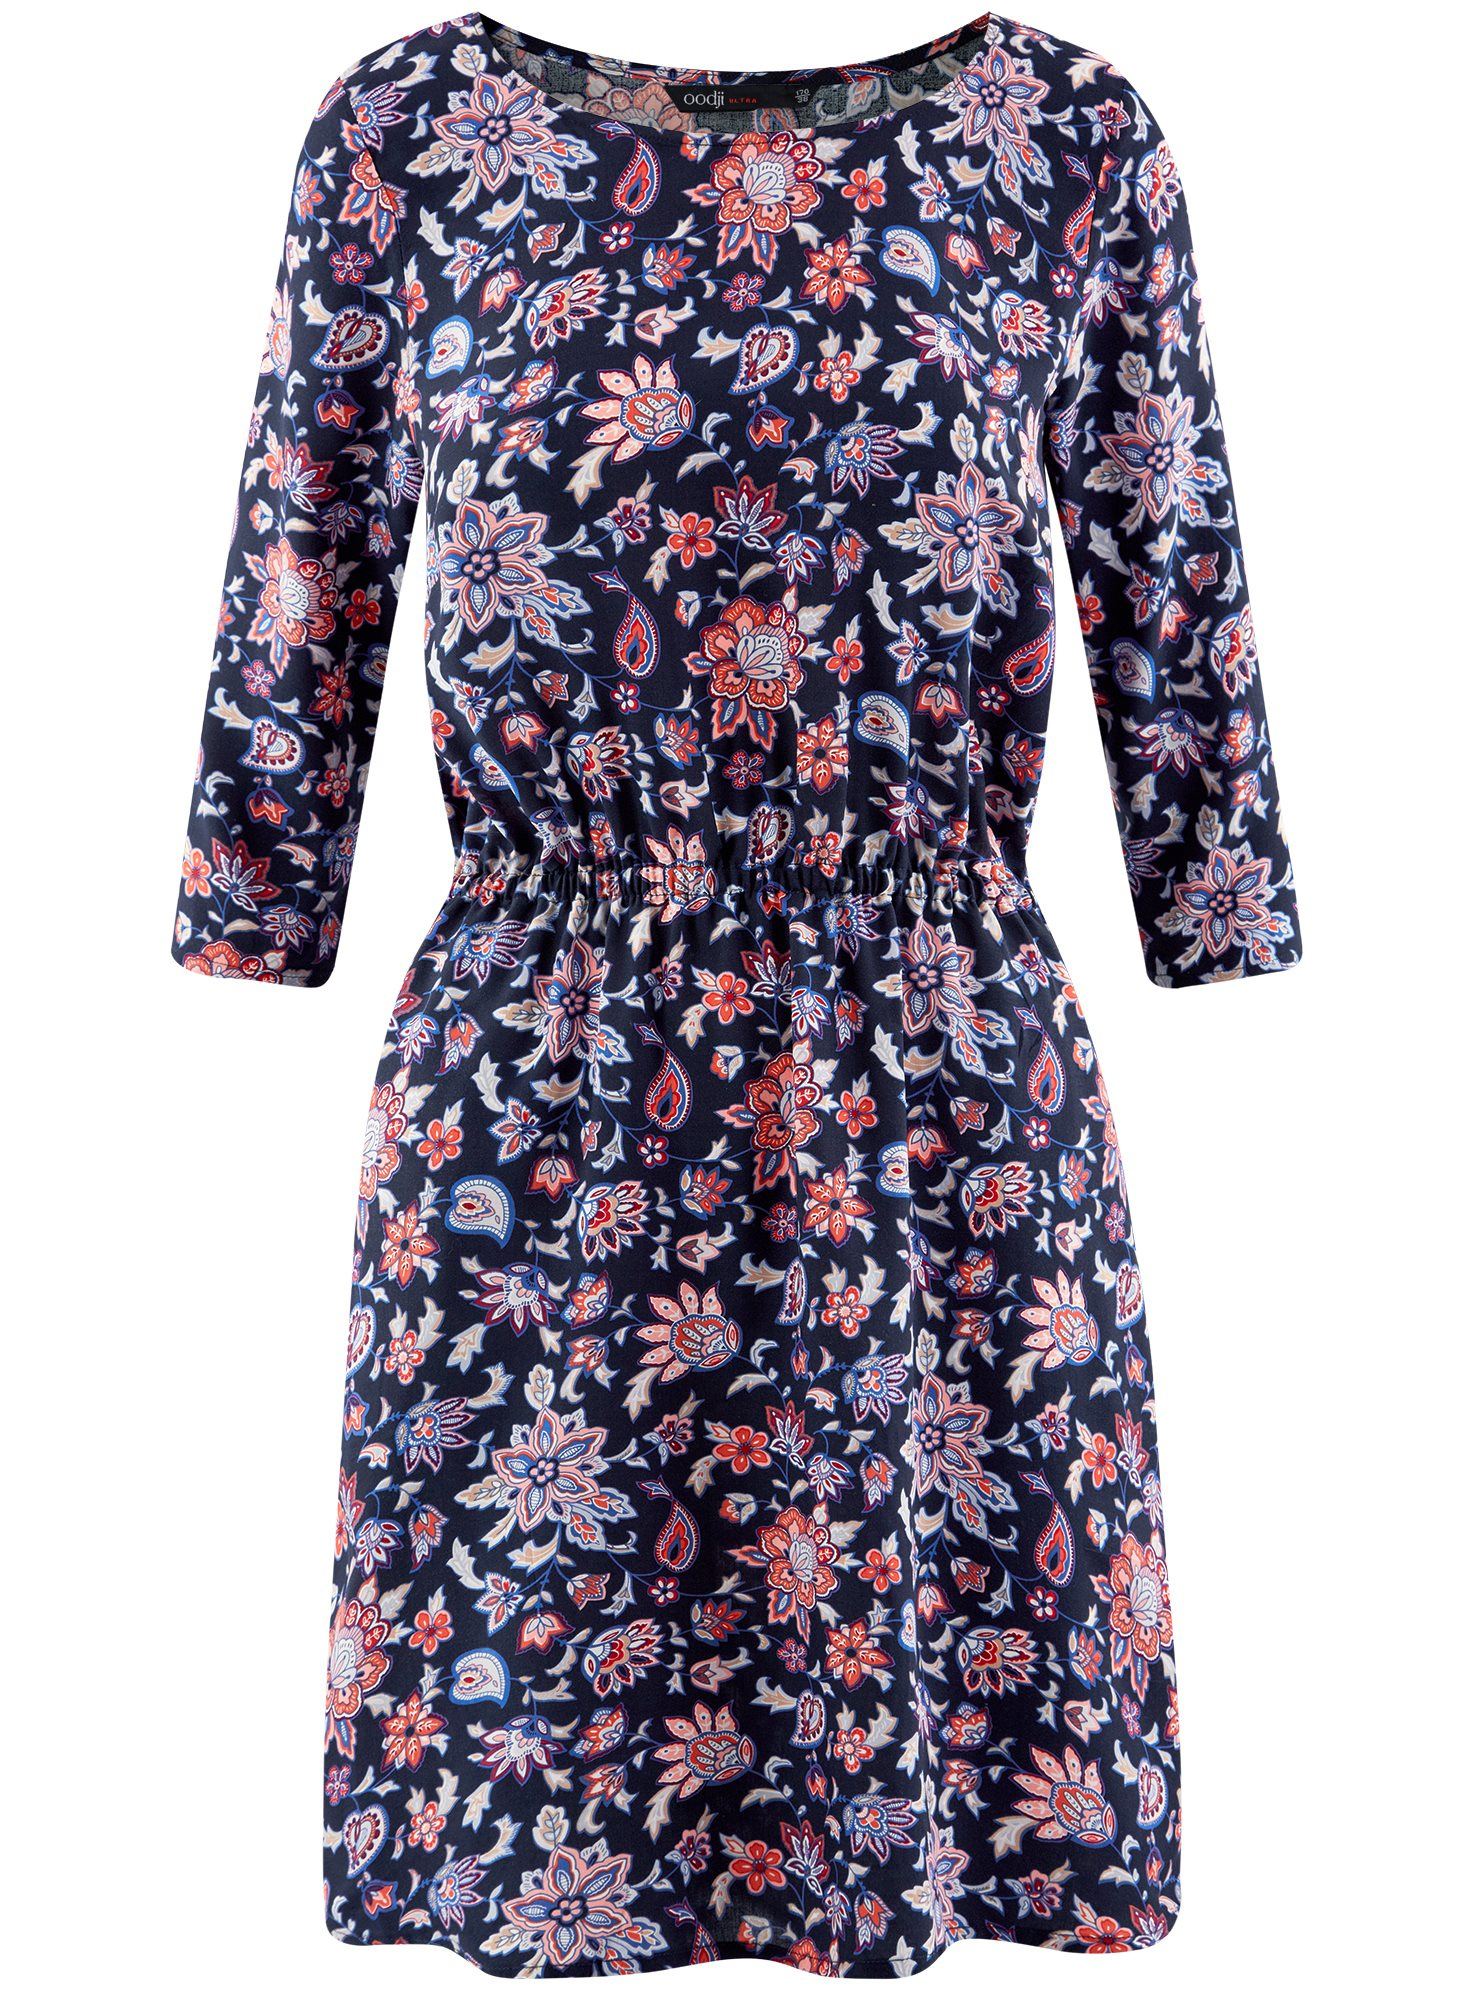 Платье вискозное с рукавом 3/4 oodji для женщины (синий), 11901153-1B/42540/7945F